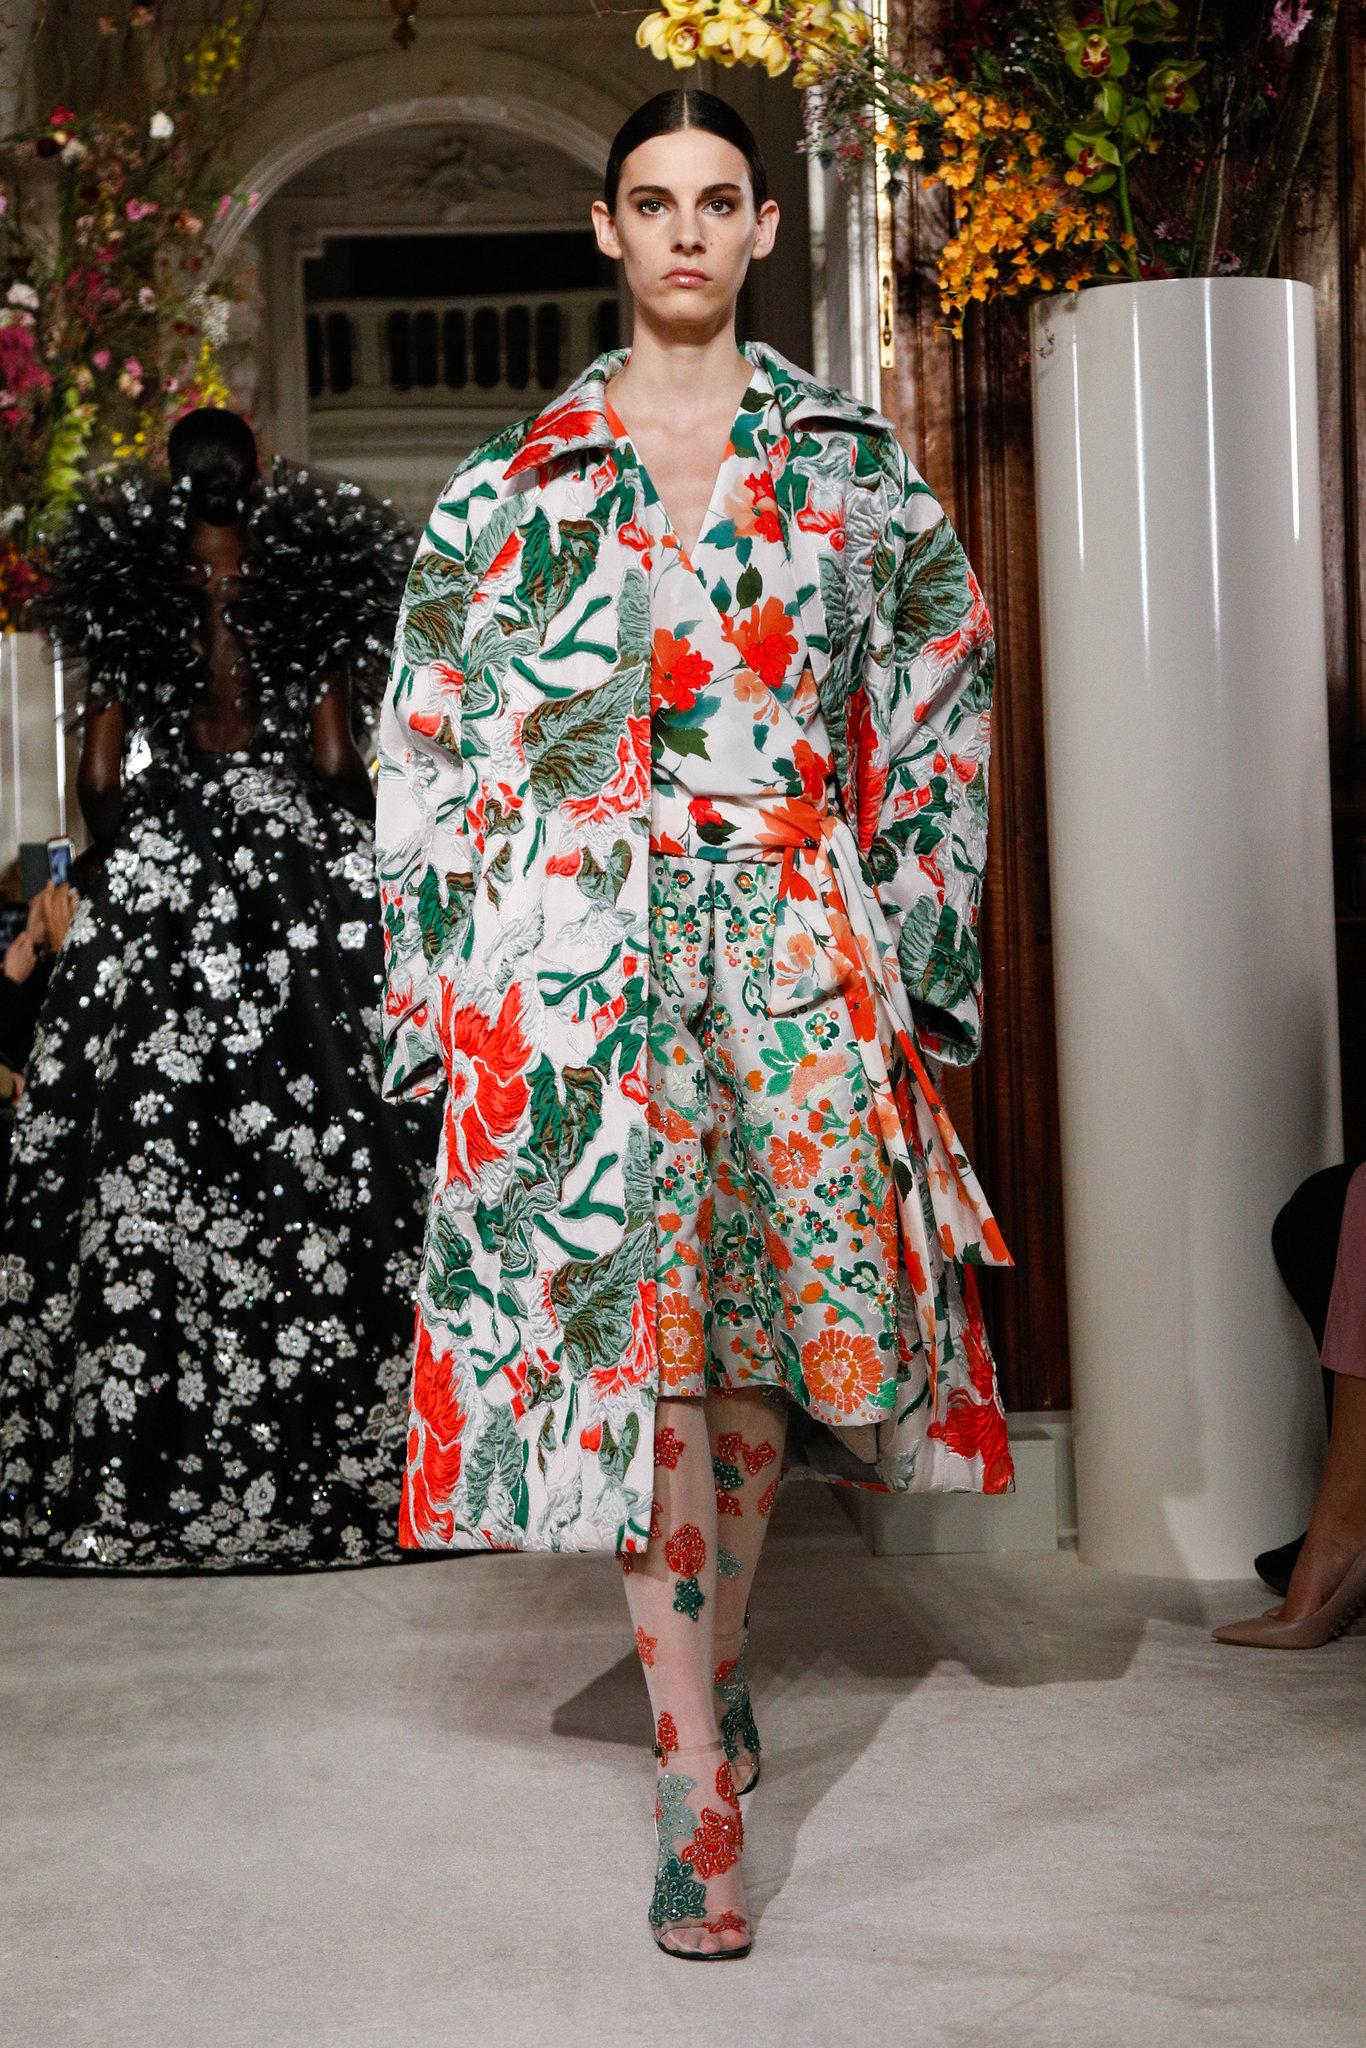 Valen-spring-2019-couture-slide-S57U-superJumbo.jpg